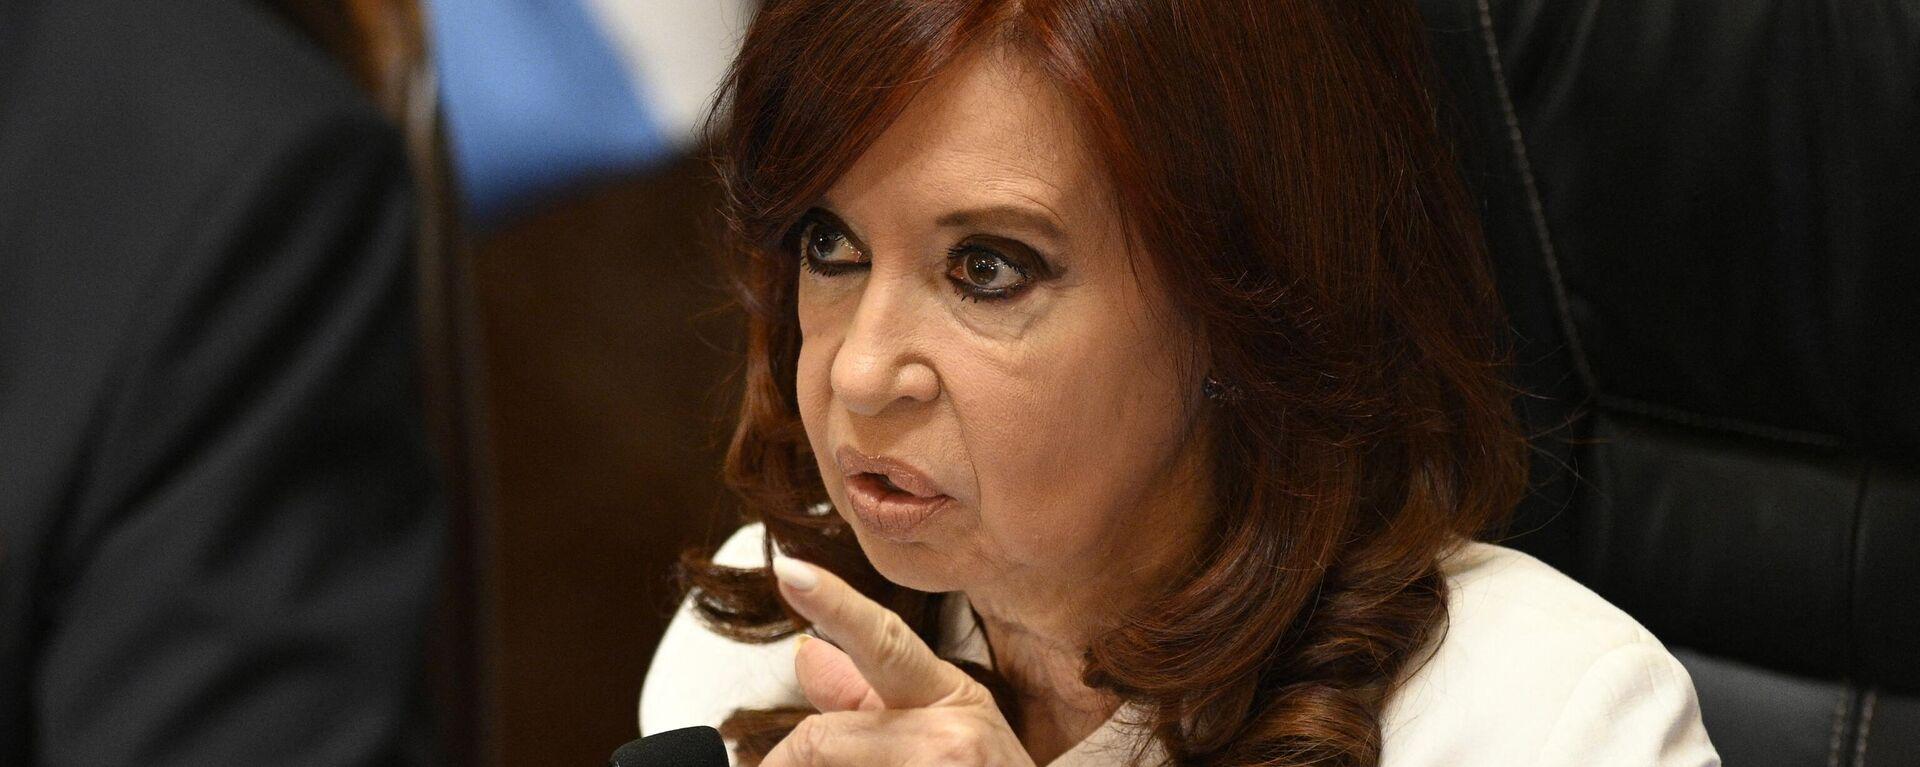 Cristina Fernández de Kirchner, vicepresidenta de Argentina - Sputnik Mundo, 1920, 16.09.2021